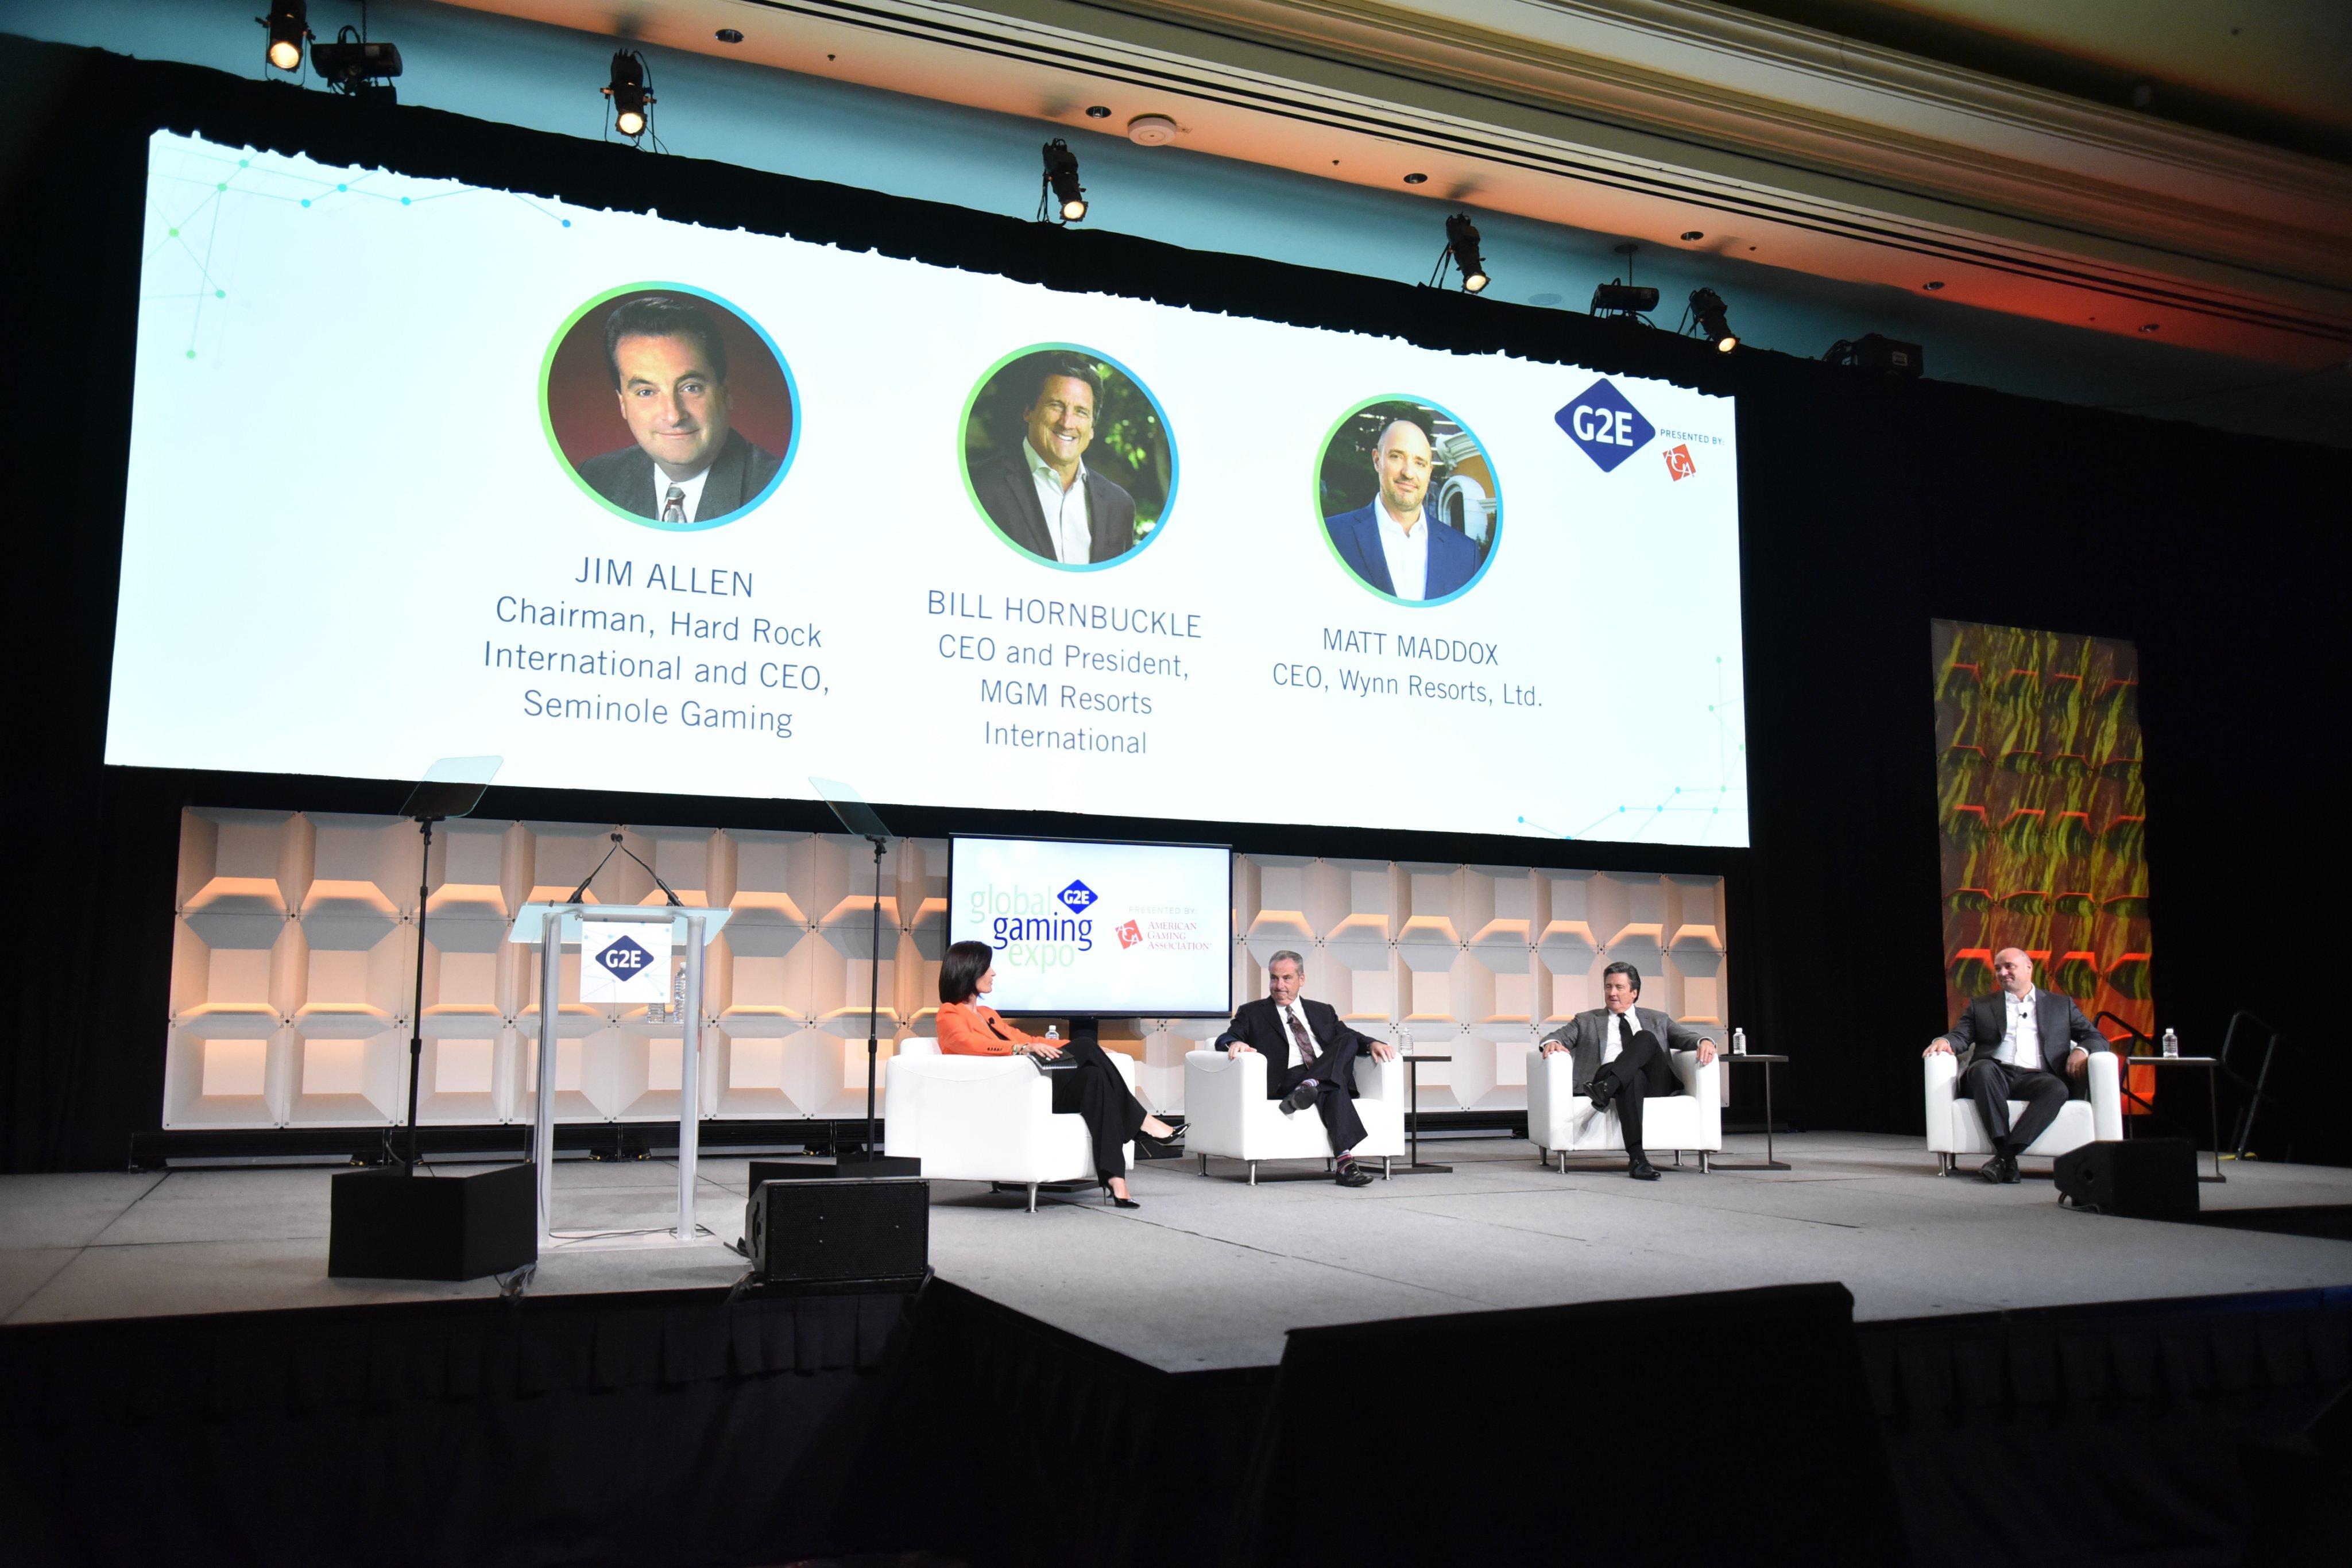 A G2E 2021 conference